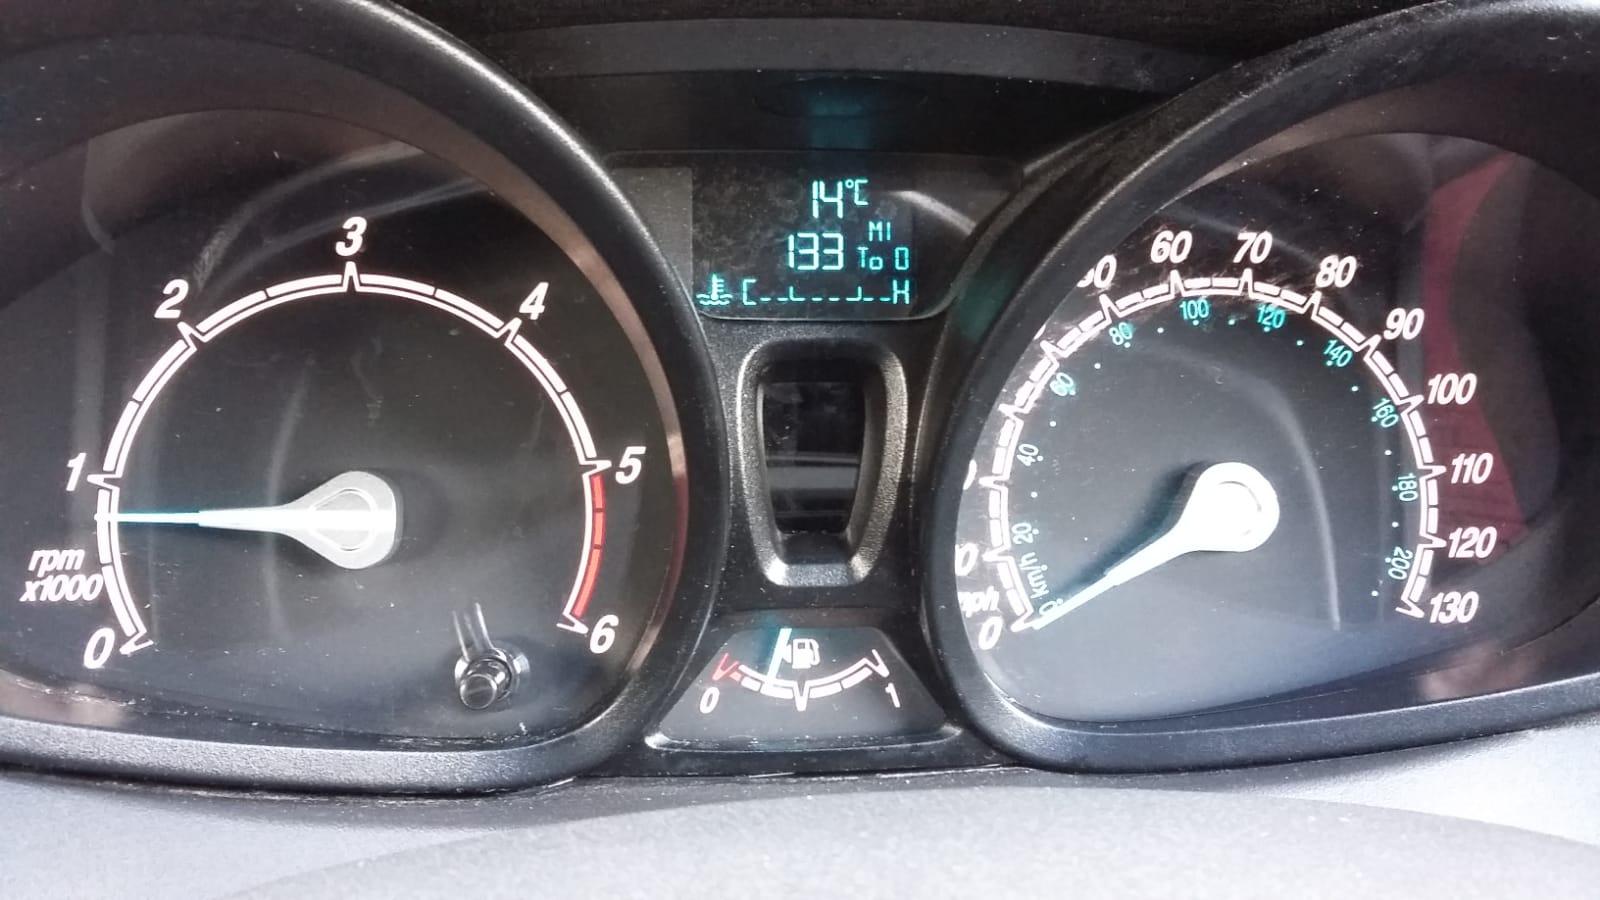 Lot 93 - 2015/15 REG FORD FIESTA ECONETIC TECH TDCI 1.6 DIESEL CAR DERIVED VAN, SHOWING 0 FORMER KEEPERS